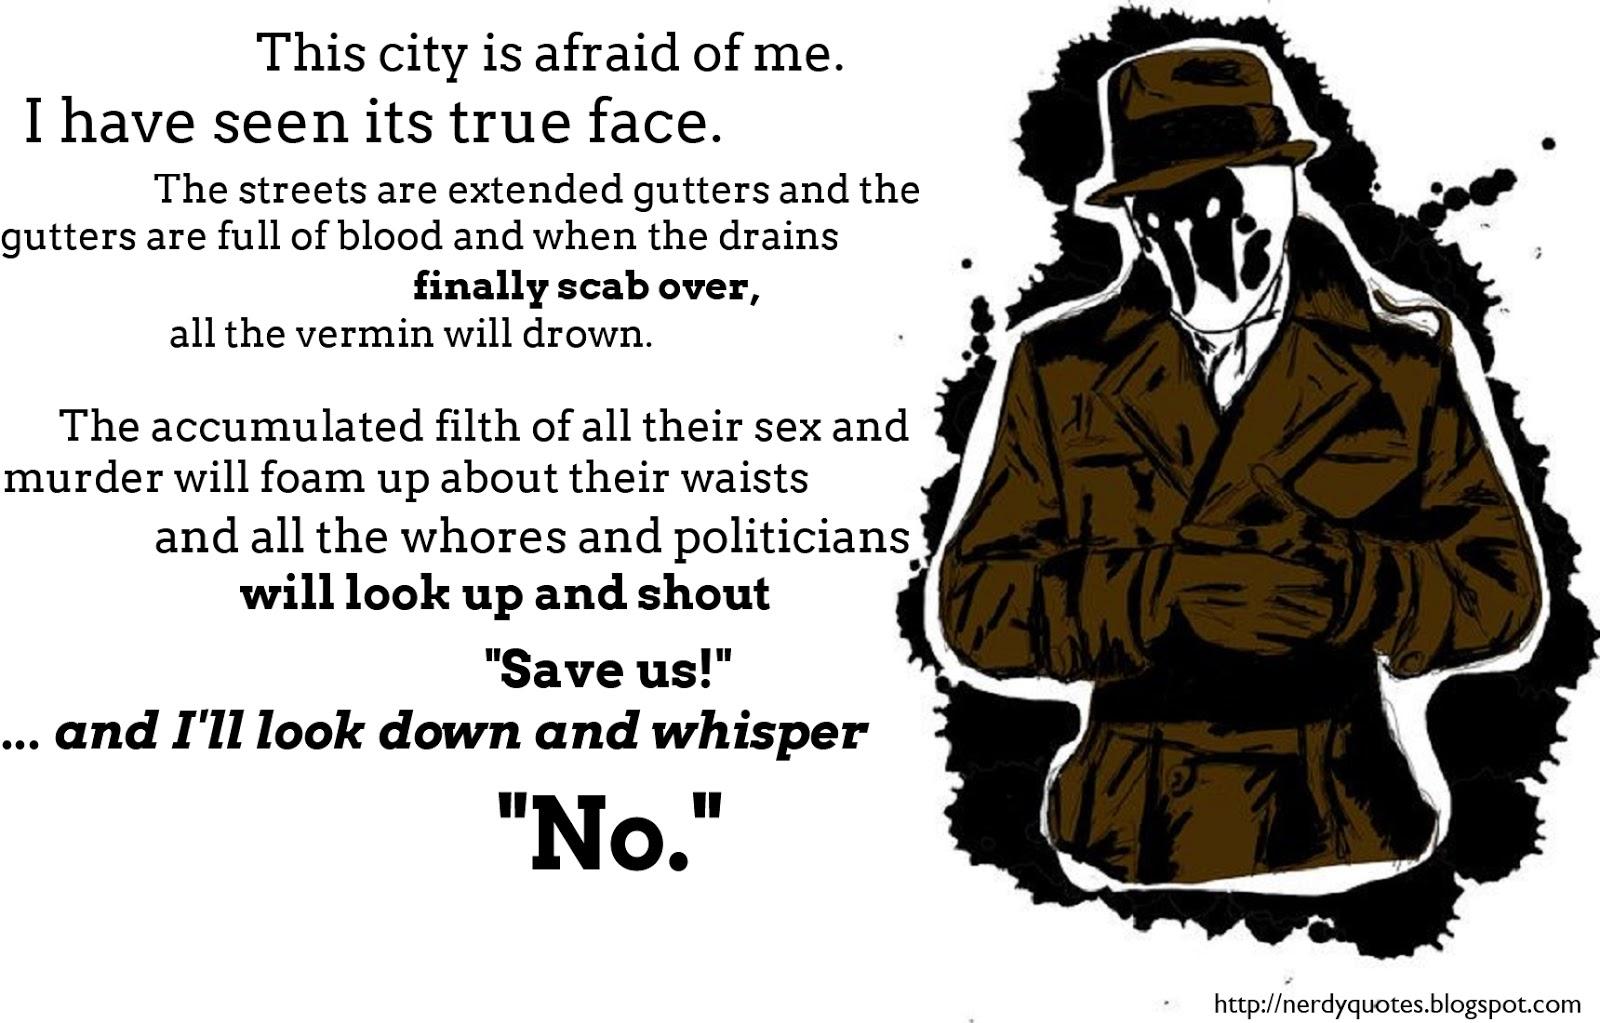 Rorschach Quotes Ill Whisper No. QuotesGram